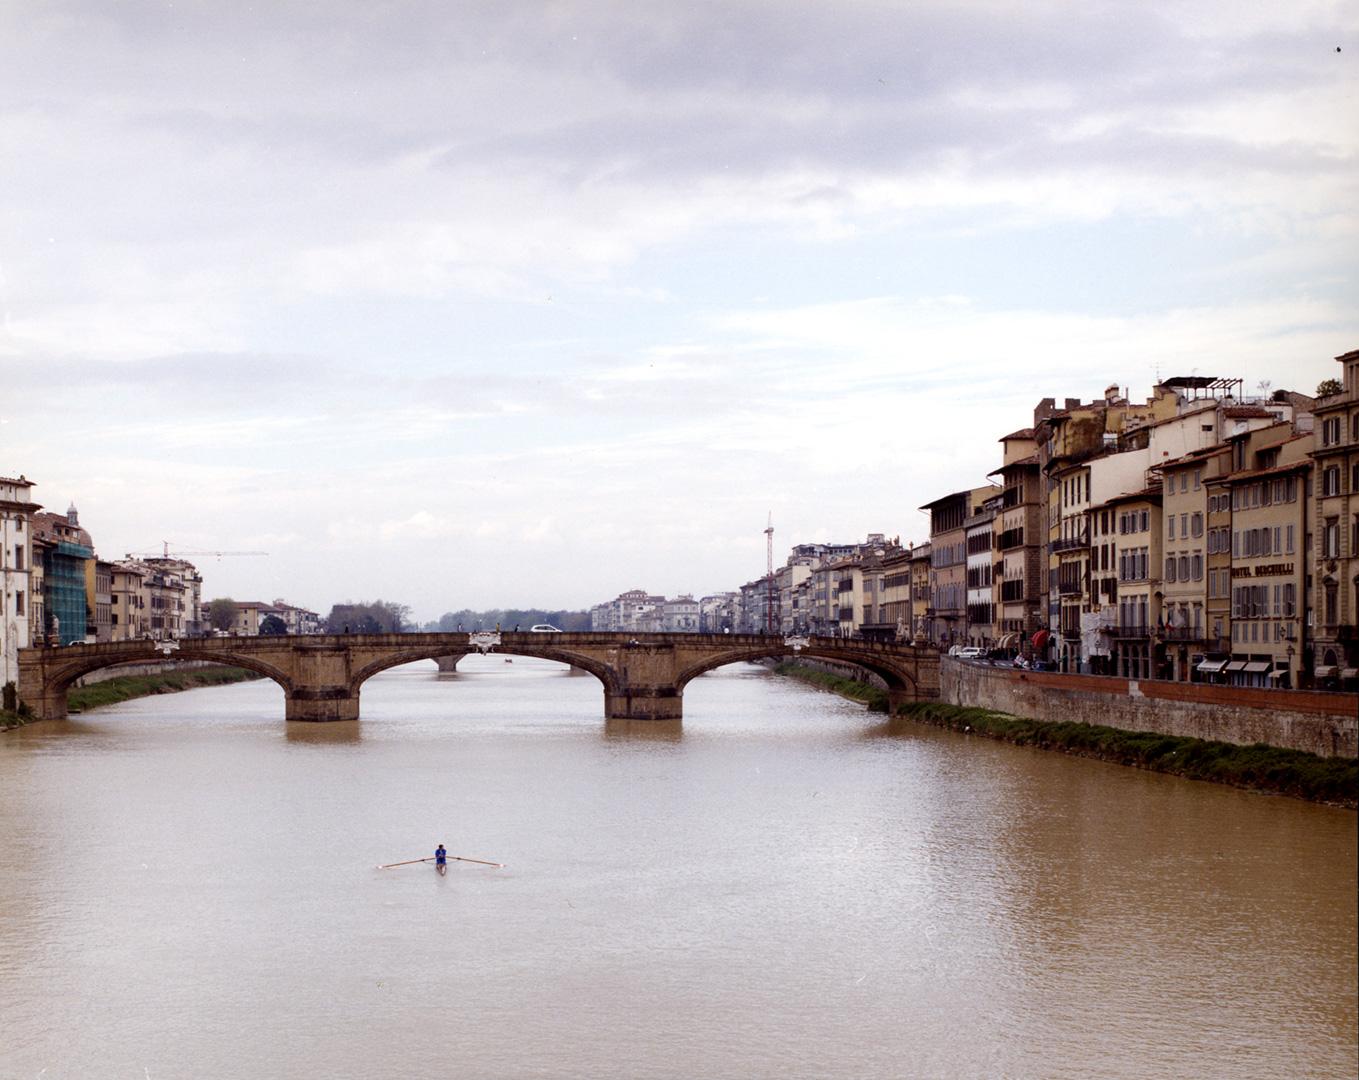 jacob-burckhardt_20_Firenze-Santa-Trinita-1997-17